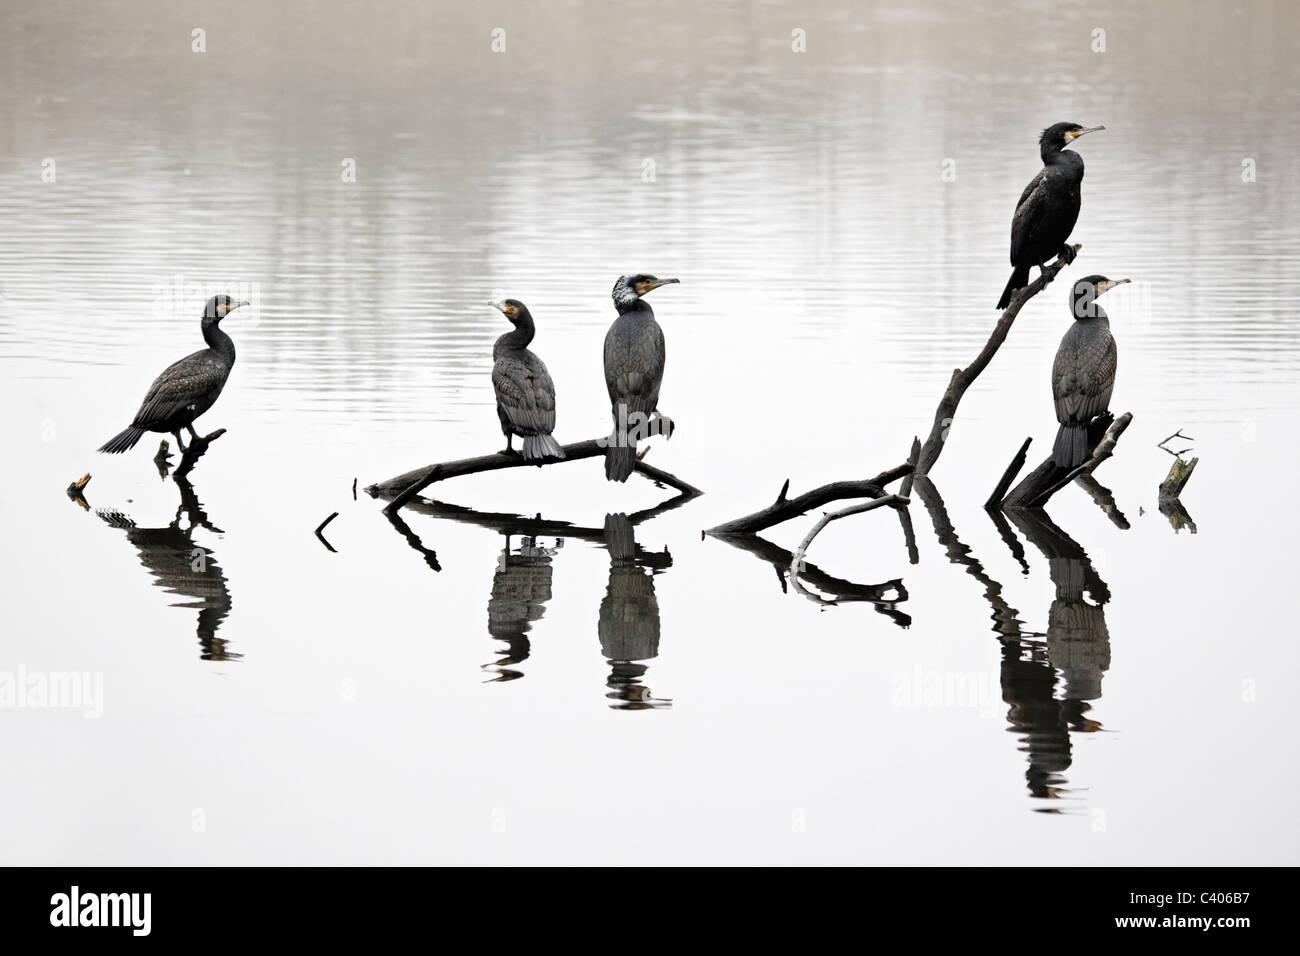 Cormorant, Phalacrocorax carbo, group of birds on branch, Midlands, April 2011 - Stock Image